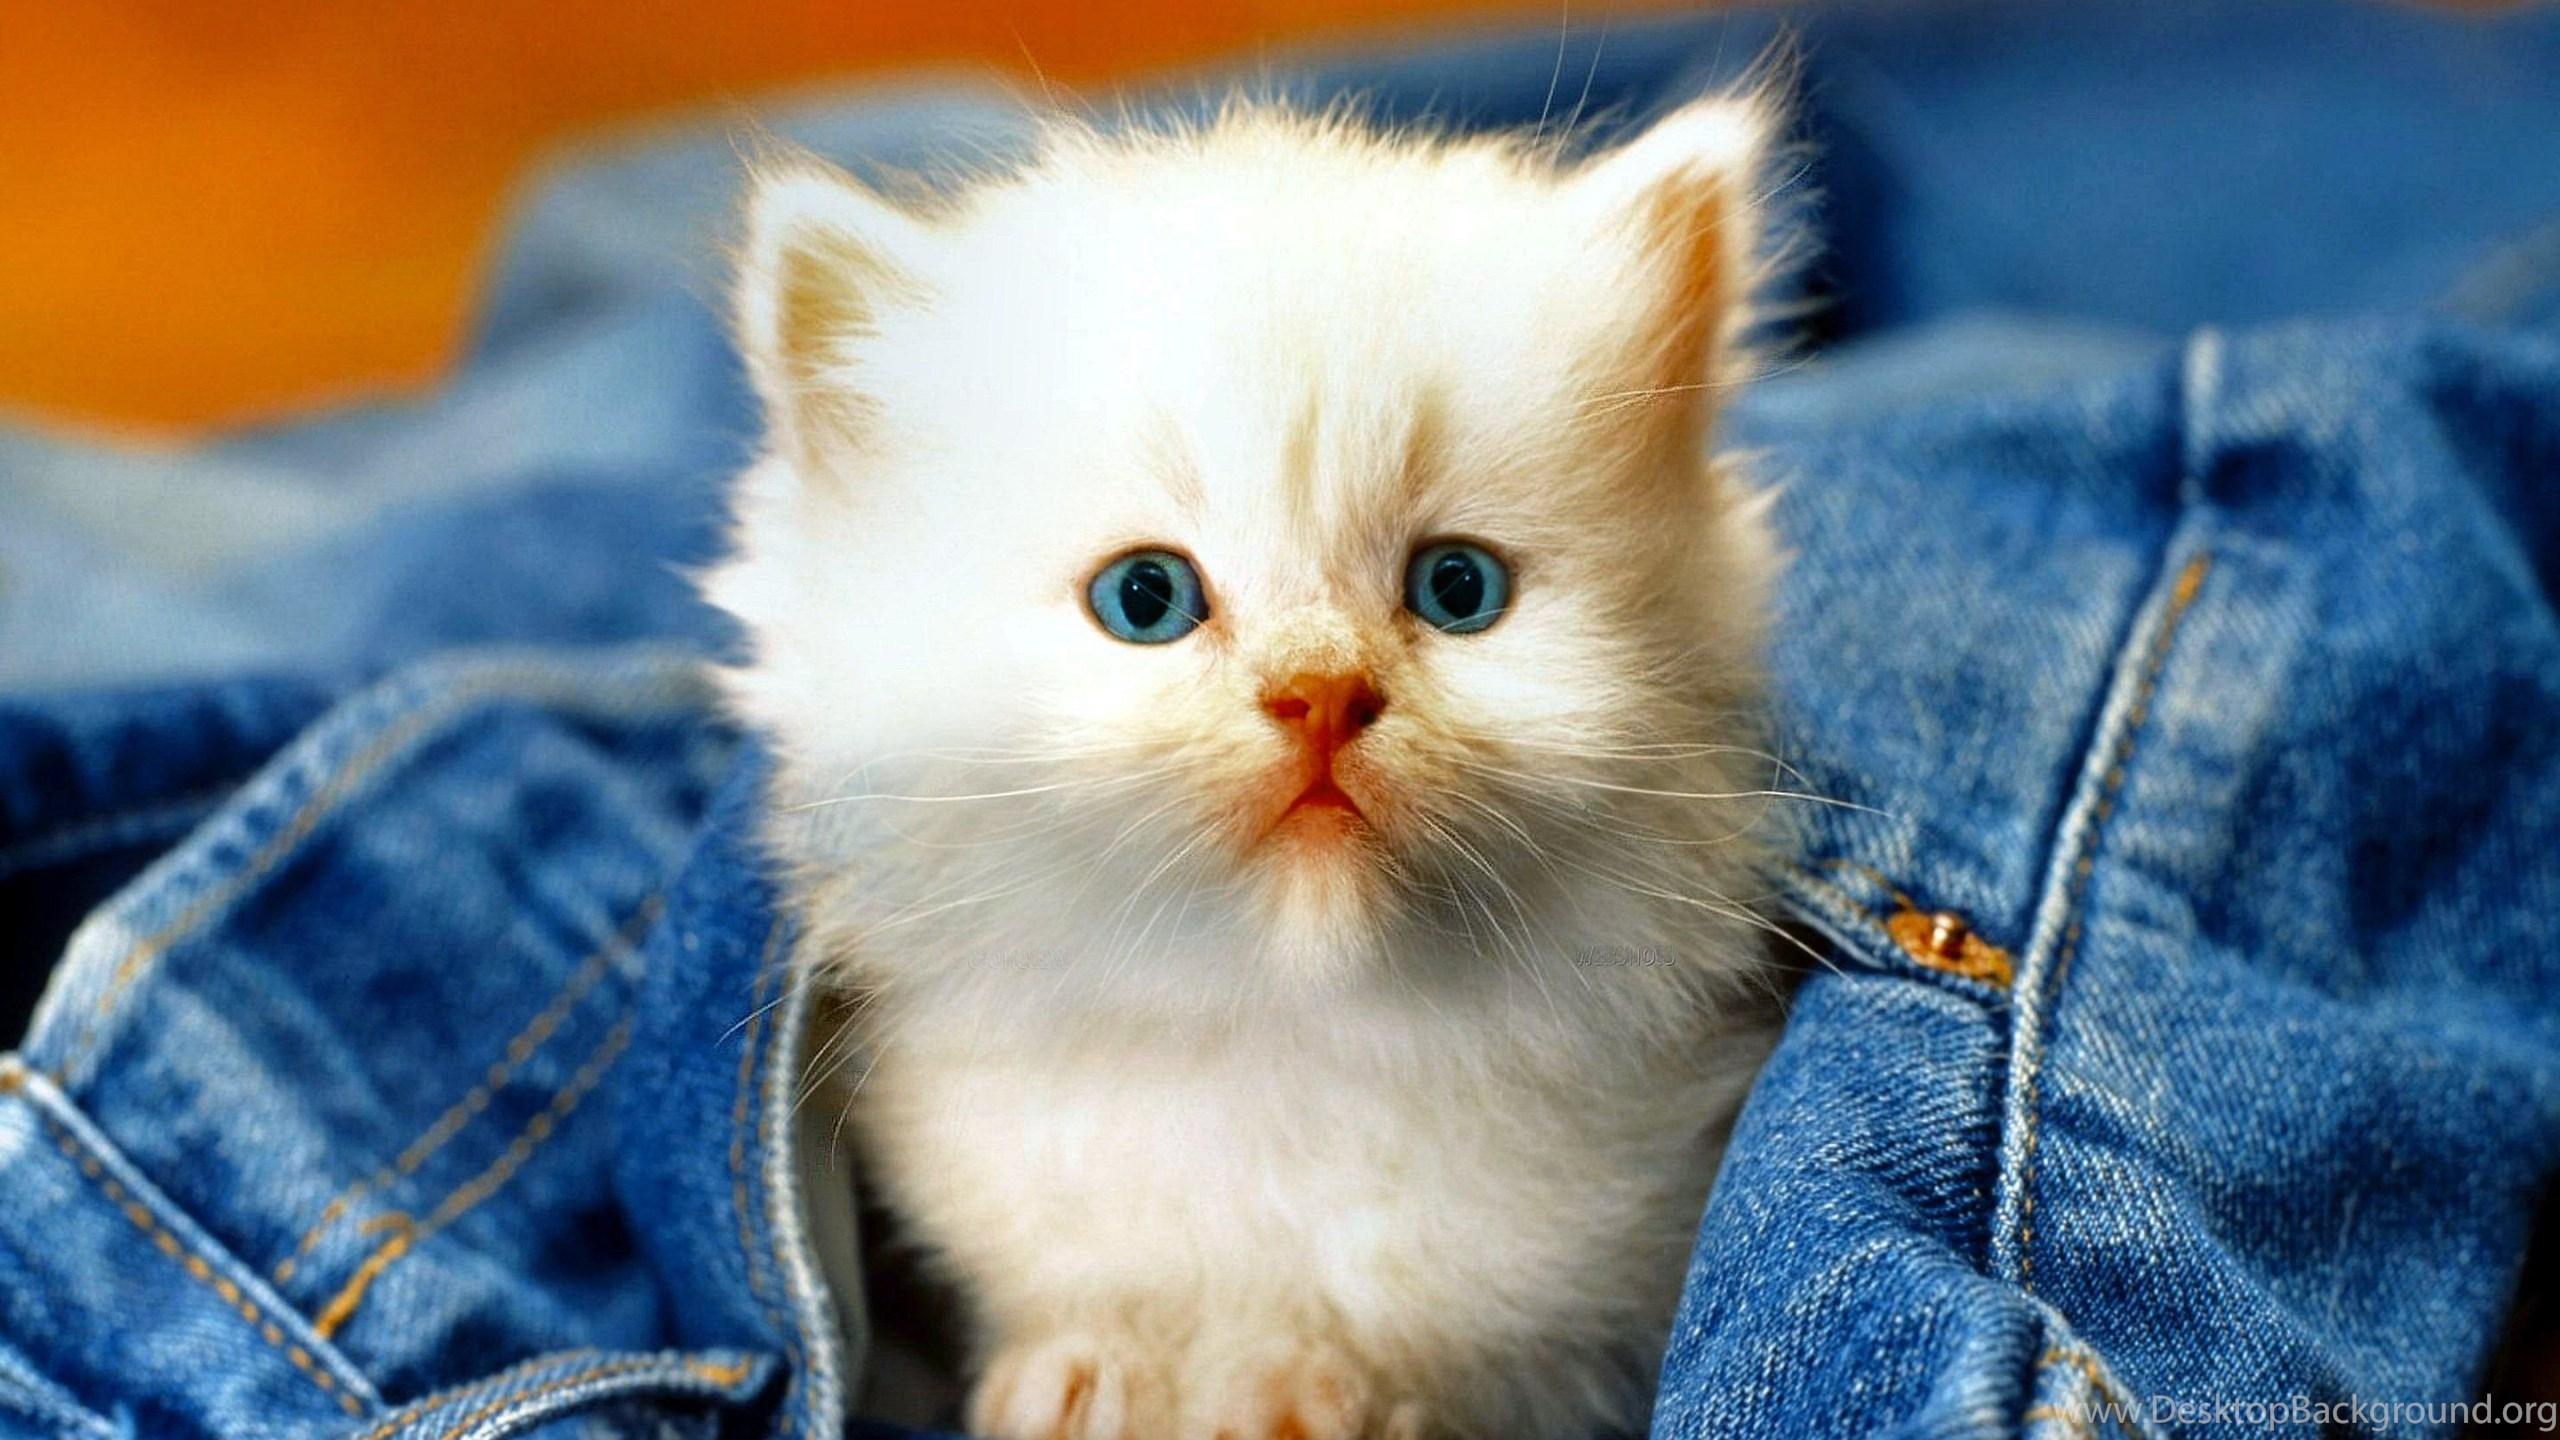 Must see Wallpaper Mobile Kitten - 182227_kittens-kitten-cat-cats-baby-cute-s-wallpapers_2960x1850_h  Photograph_231071.jpg